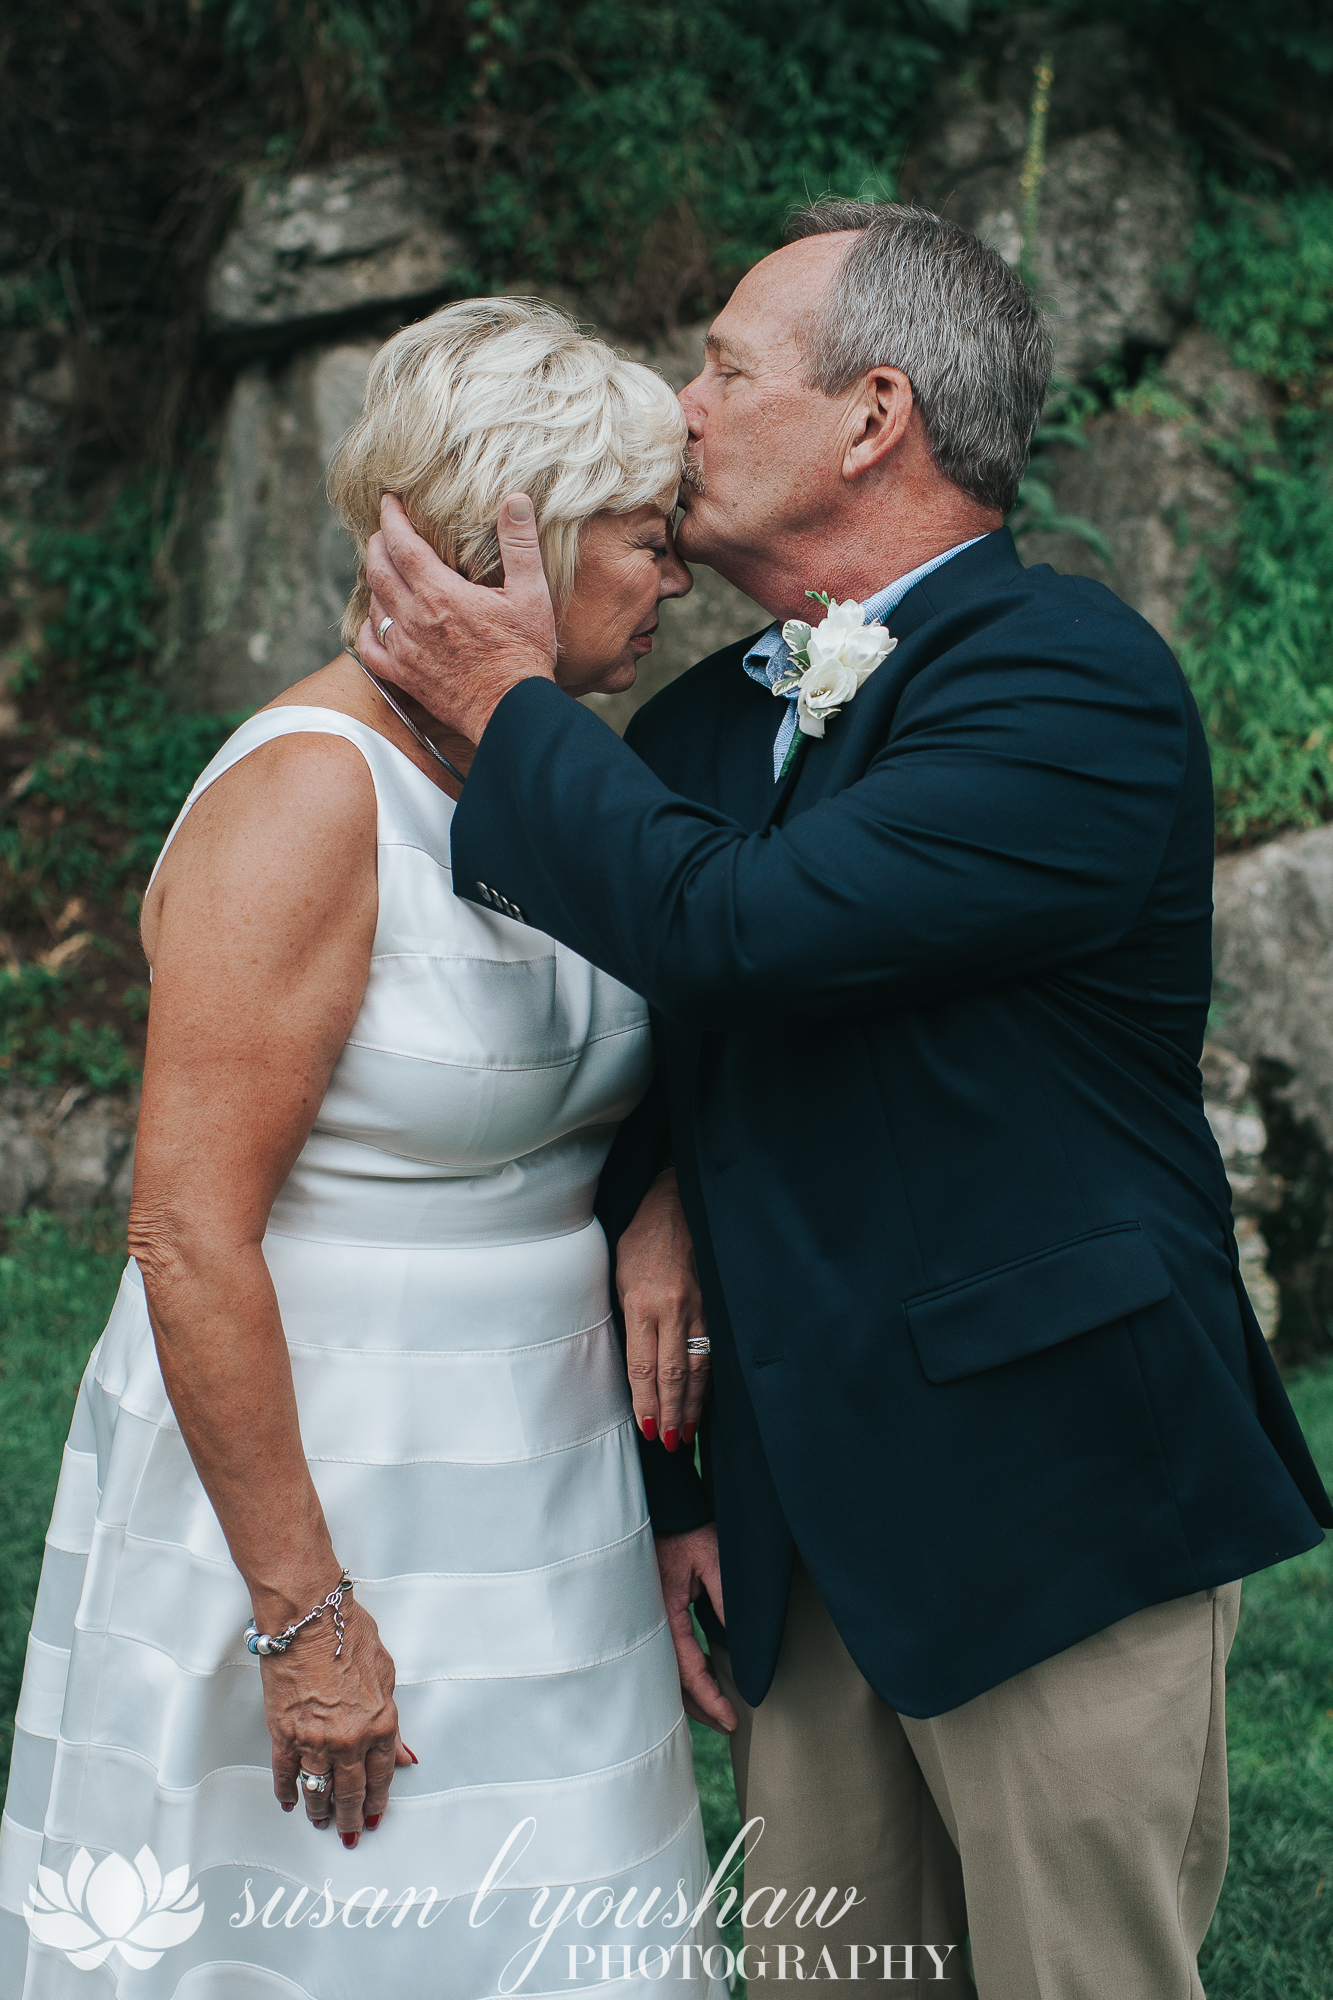 BLOG Carolyn Adams and Jim McCune 07-04-2018 SLY Photography-126.jpg